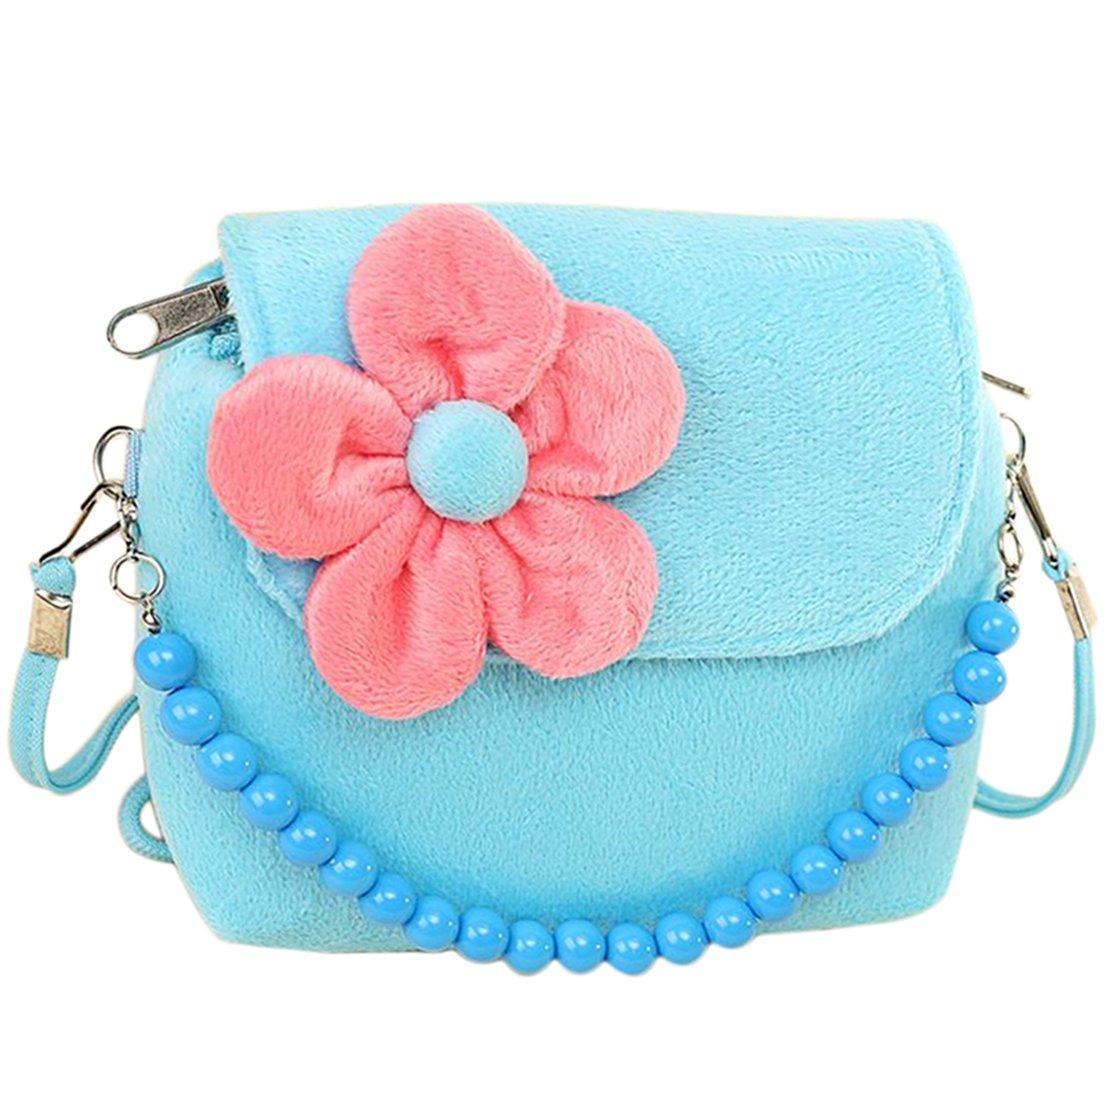 Hydaa Little Girls Handbag Princess Shoulder Bag Fuzzy Floral Cute Purse for Toddlers Preschoolers